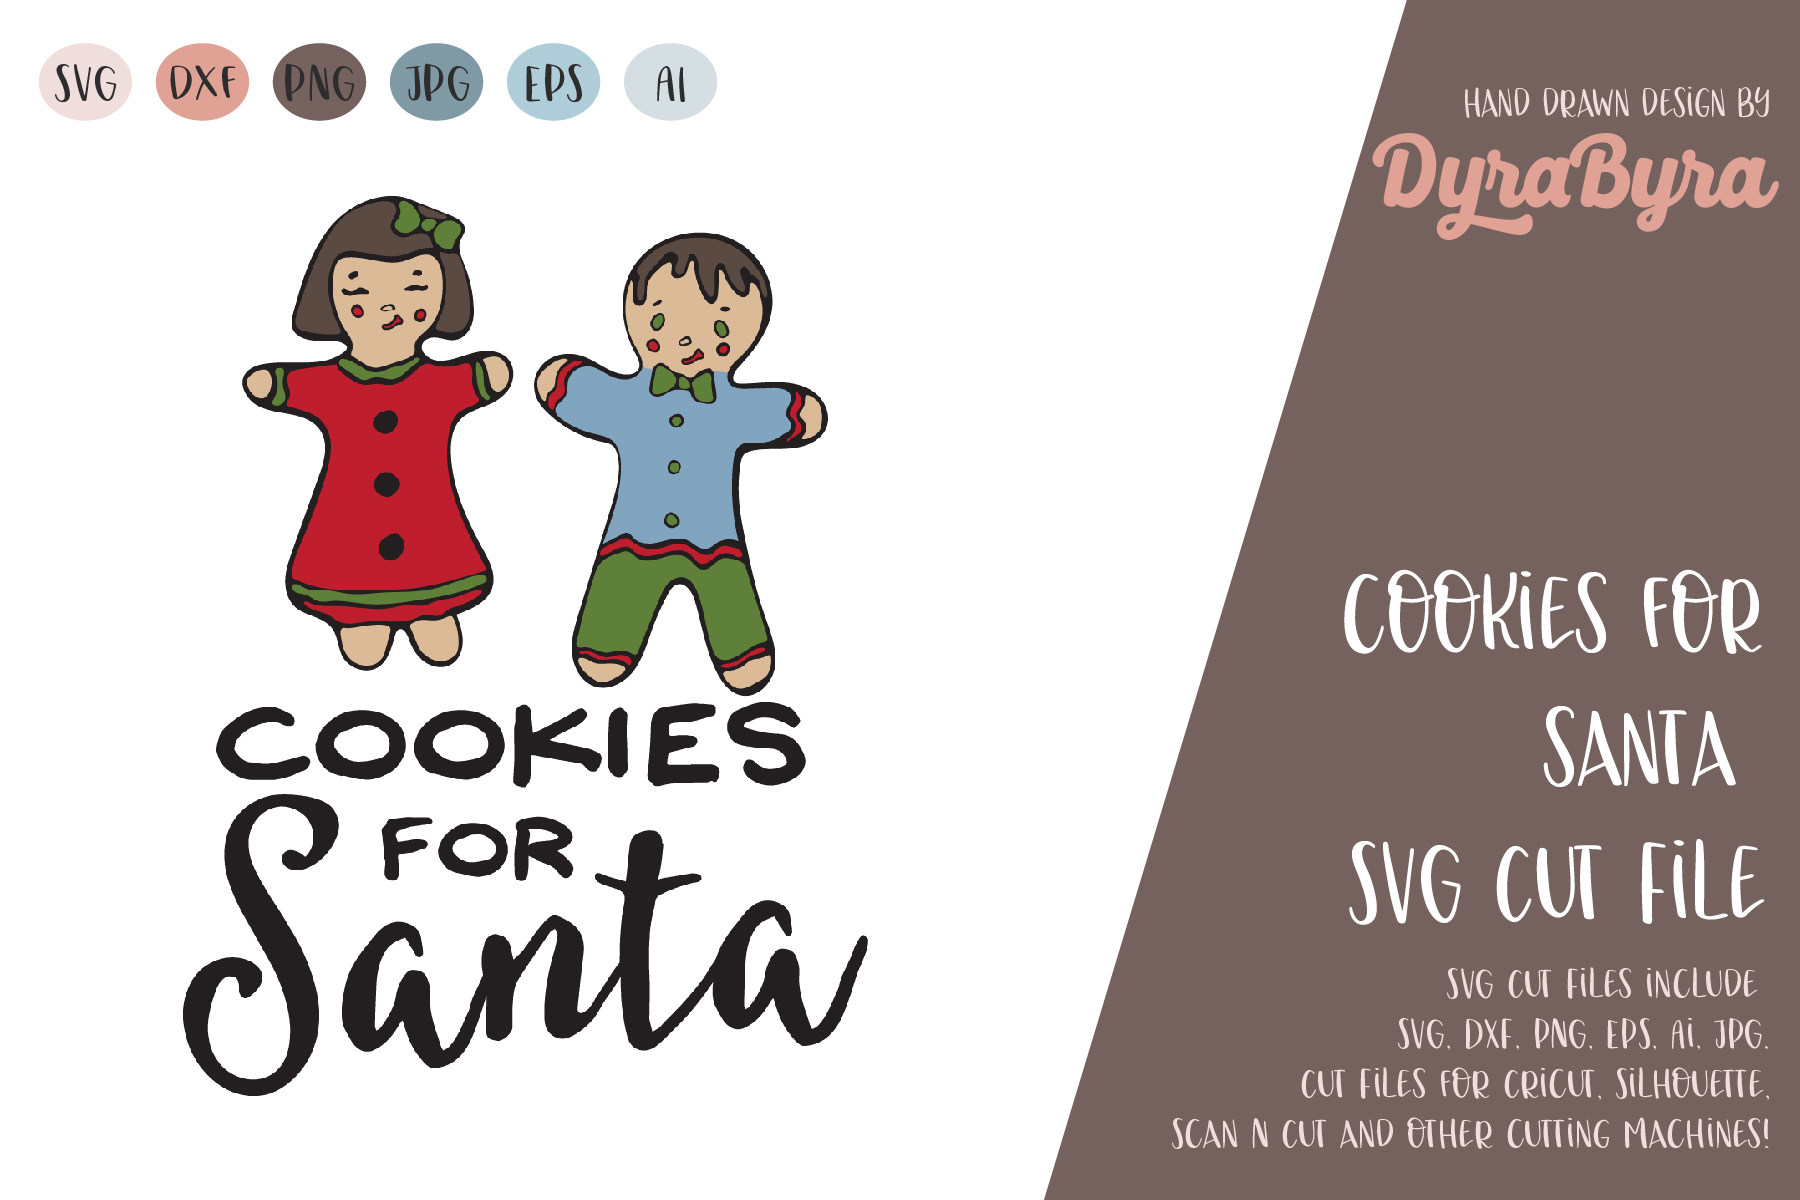 Cookies for Santa SVG / Christmas SVG / Xmas SVG example image 2